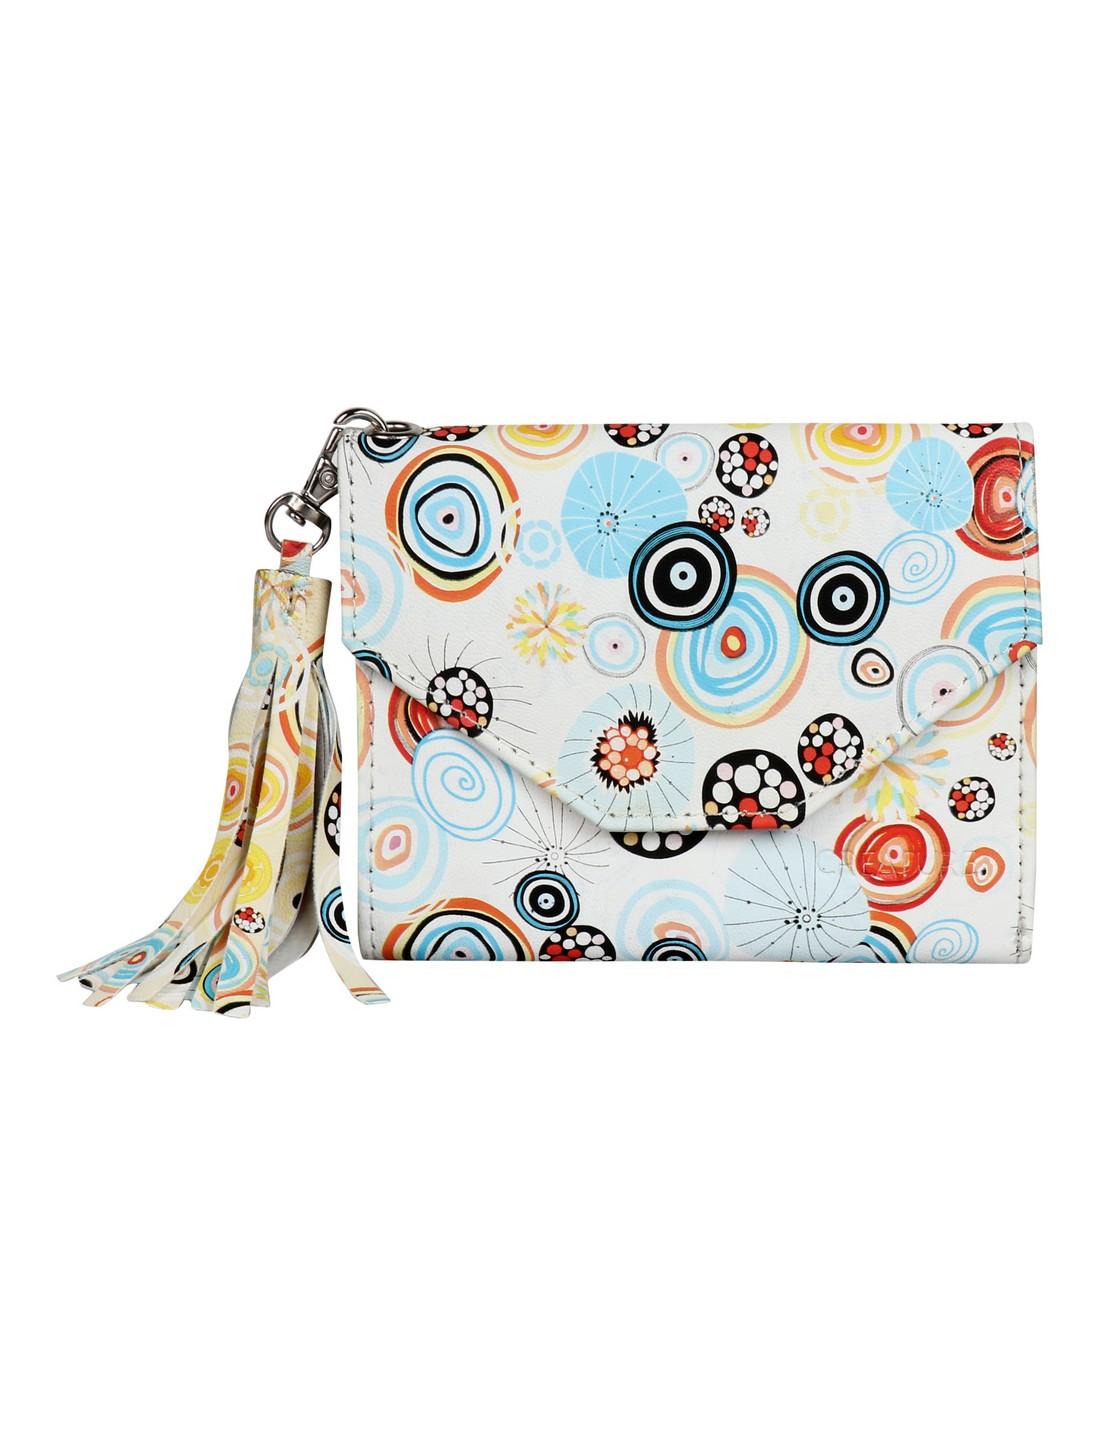 CREATURE | Creature Multicolor PU Leather Wallet for Women